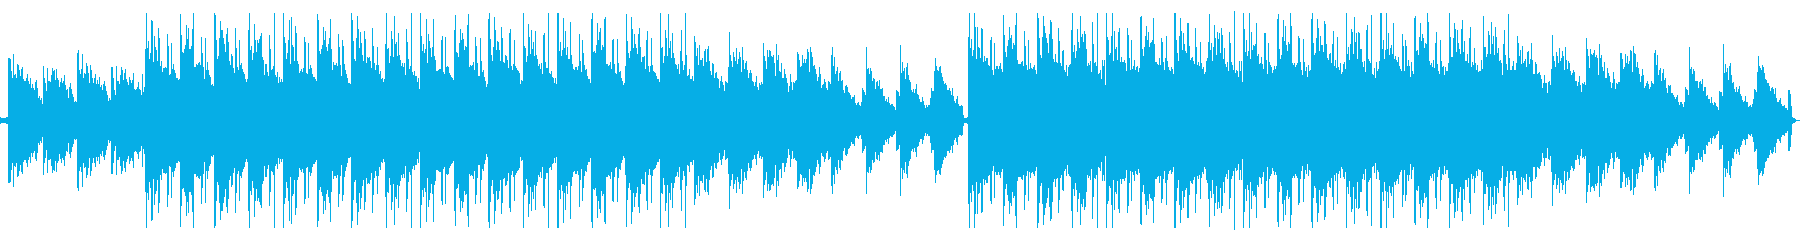 lofiでChillなBGMの再生済みの波形